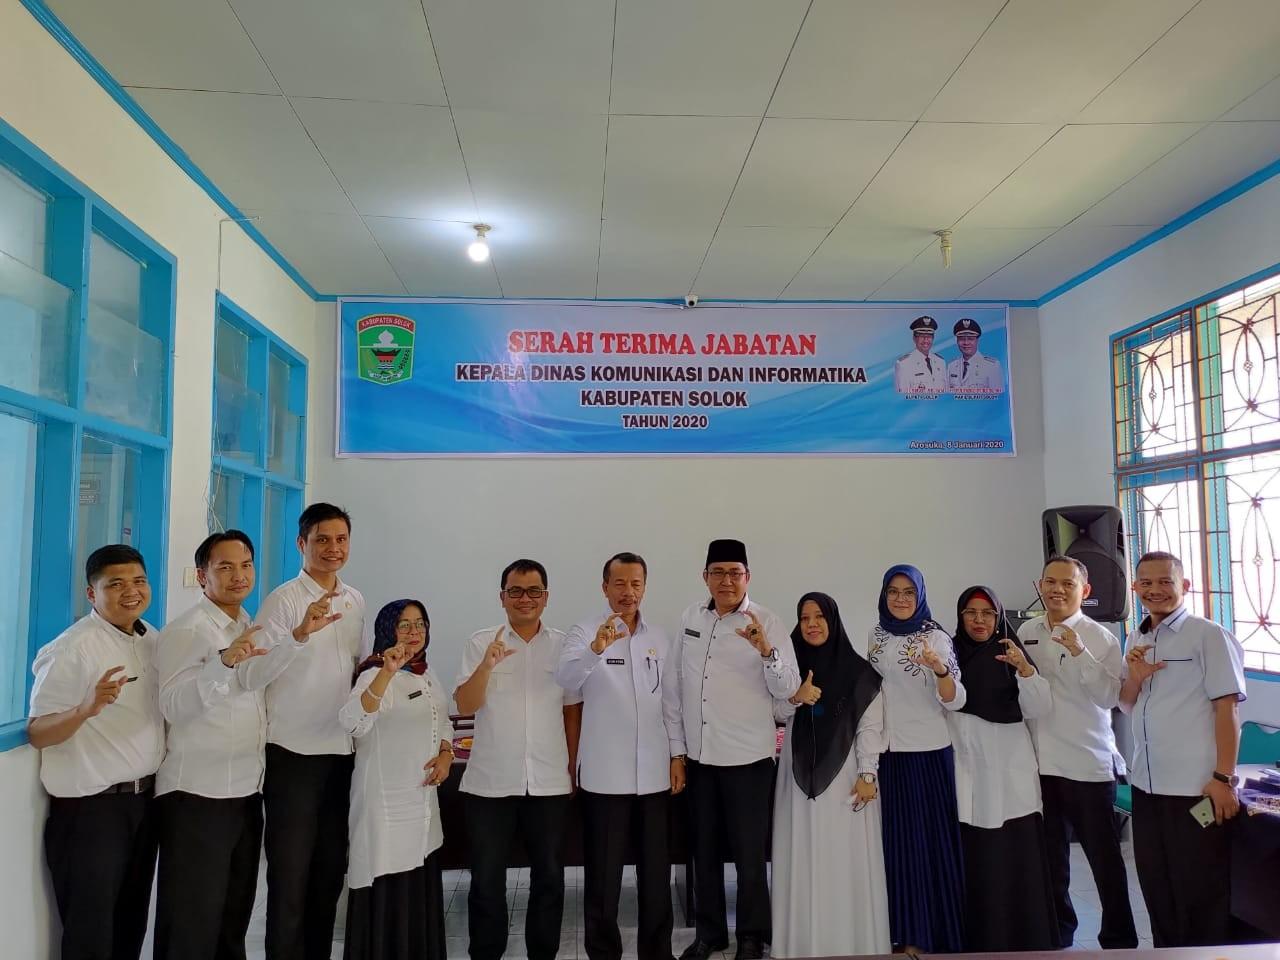 Serah Terima Jabatan Kepala Dinas Kominfo Kabupaten Solok